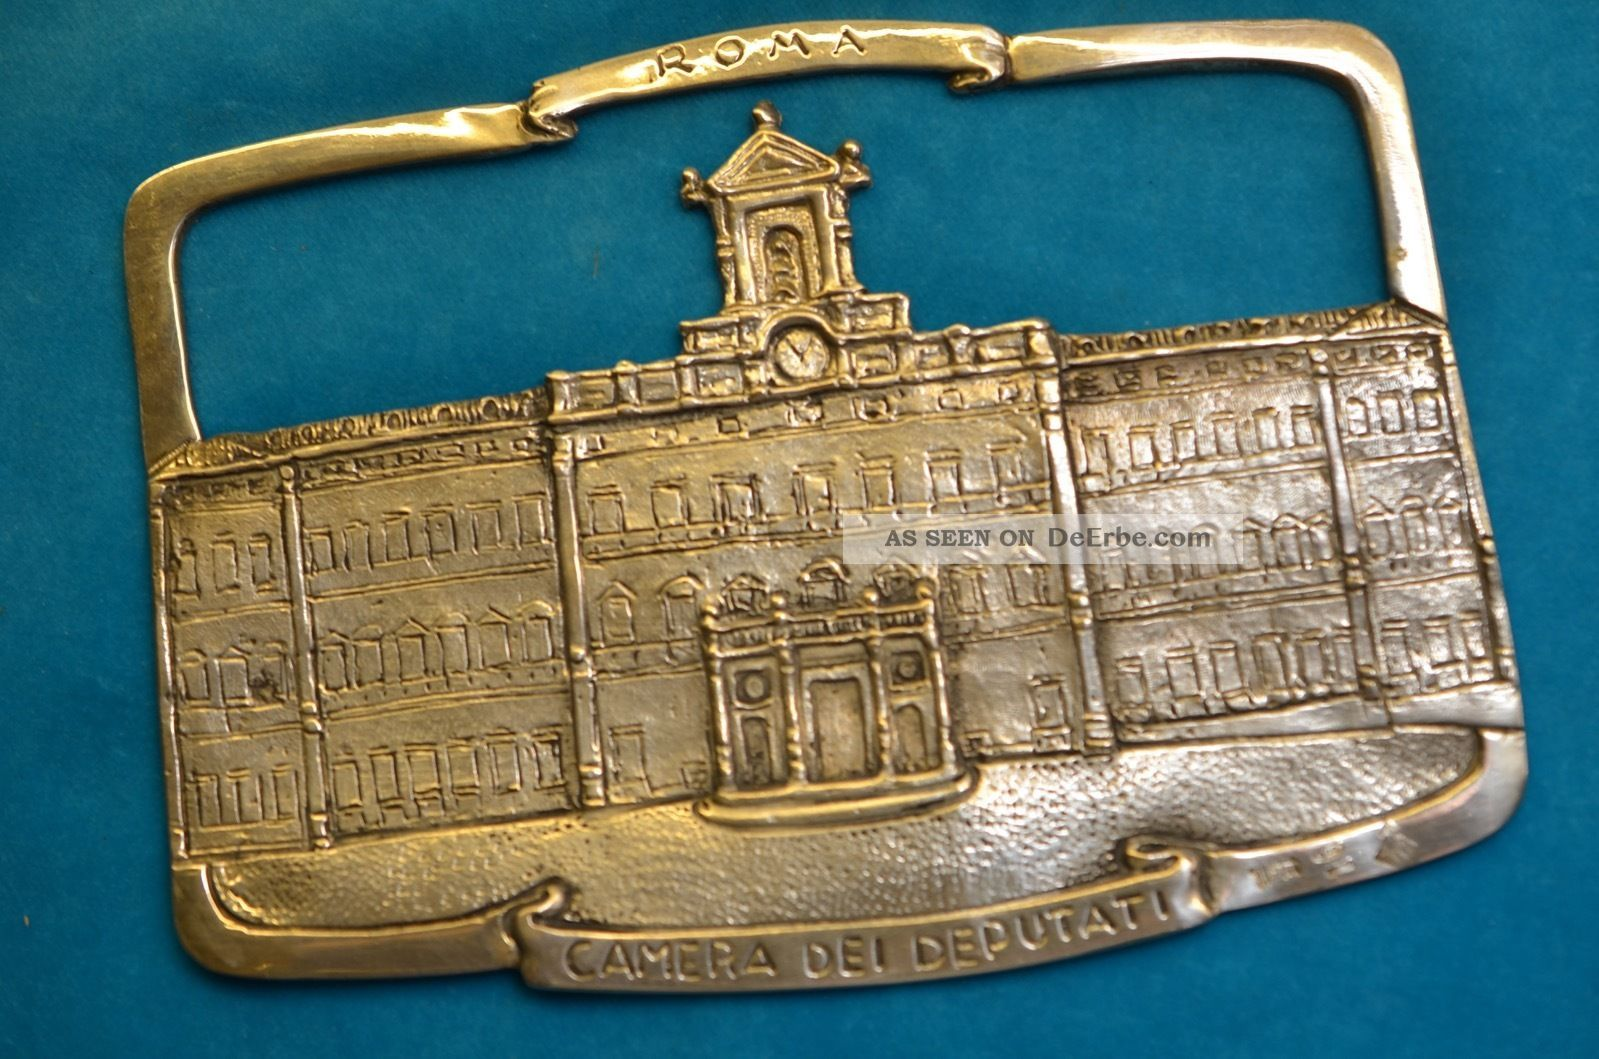 Silberrelief Roma Camera Dei Deputati Parlamentsgebäude Silber 800 Signiert Objekte nach 1945 Bild